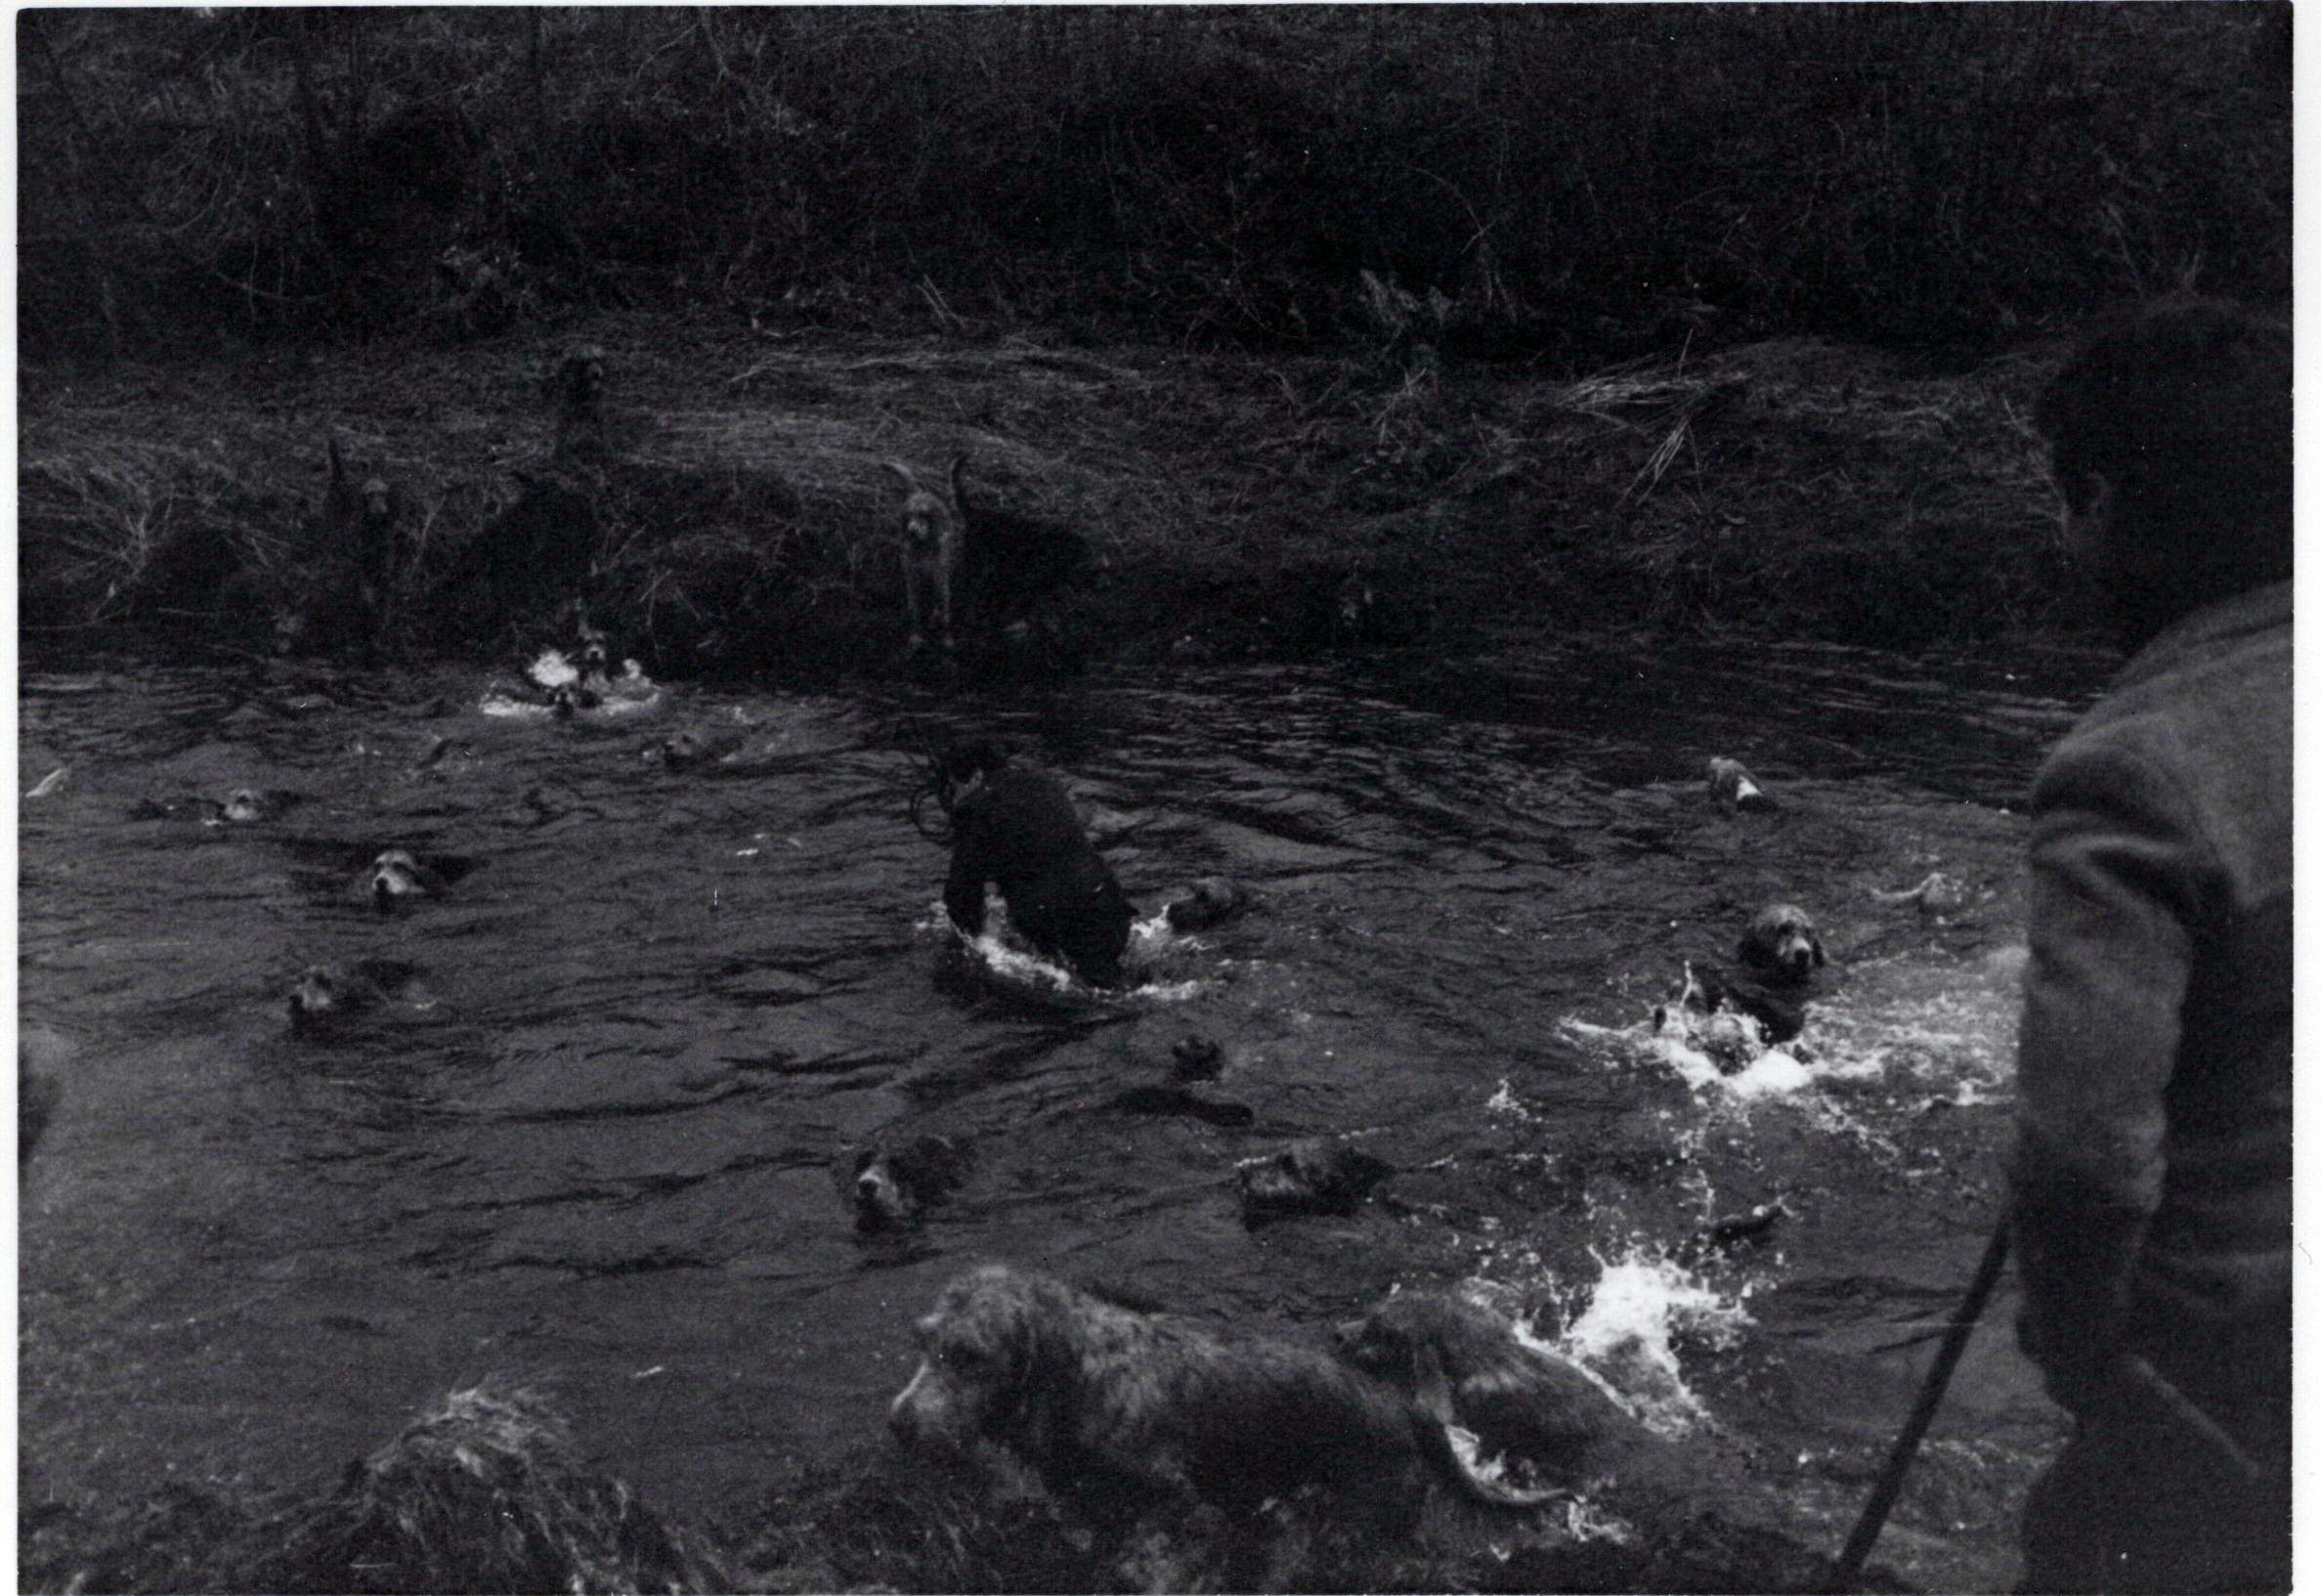 1970_Mei_Otterhound-Schotland_0011_a